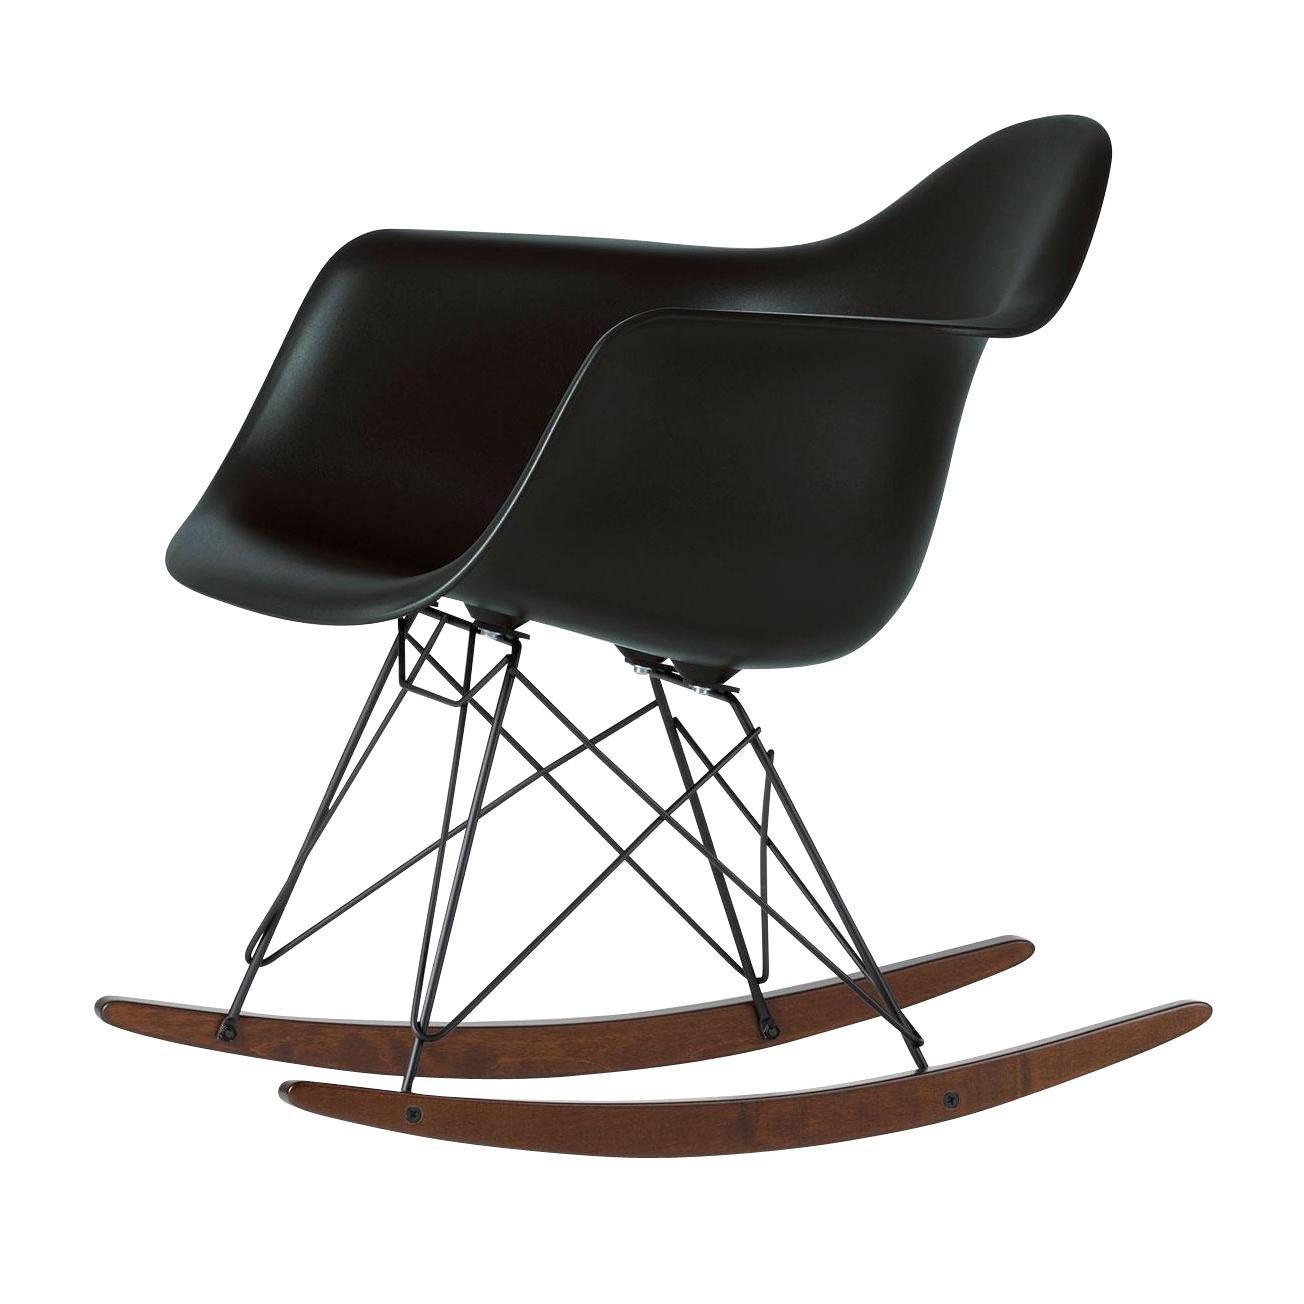 Vitra   Eames Plastic Armchair RAR Rocking Chair Black   Black Basic Dark/ Seat Polypropylene